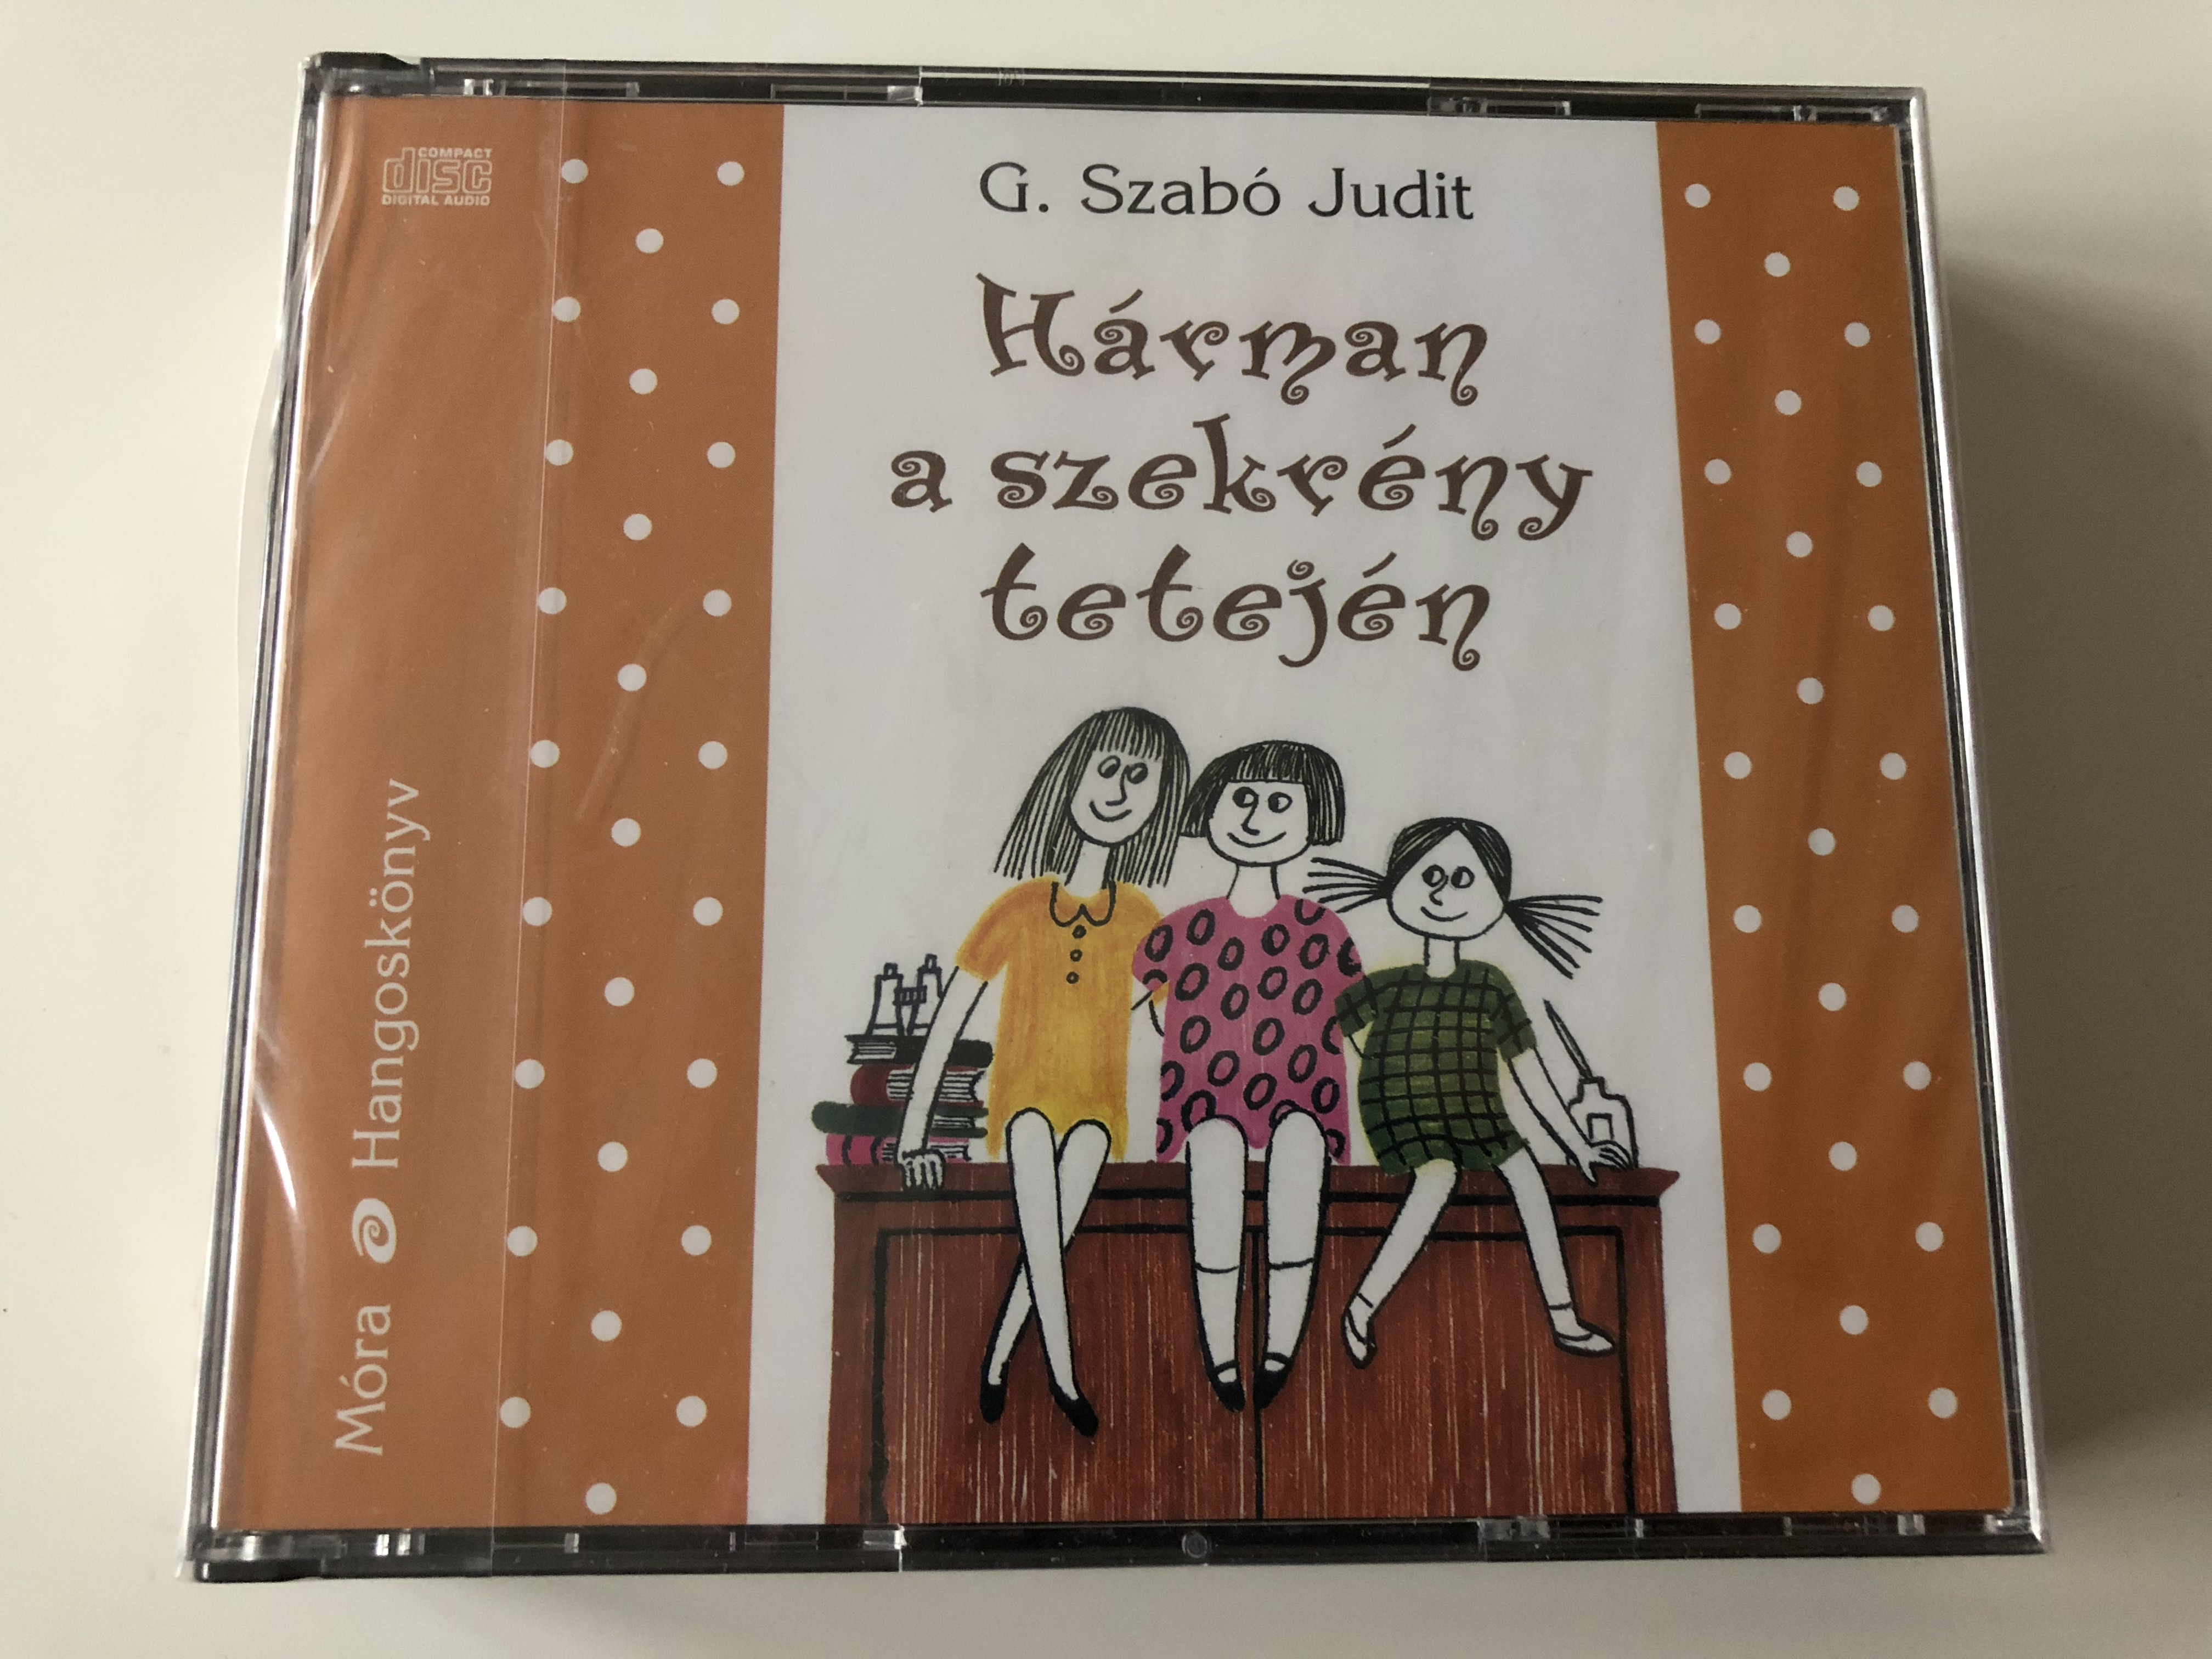 h-rman-a-szekr-ny-tetej-n-by-g.-szab-judit-hungarian-language-audio-book-read-by-zakari-s-va-4x-audio-cd-set-m-ra-k-nyvkiad-2008-1-.jpg